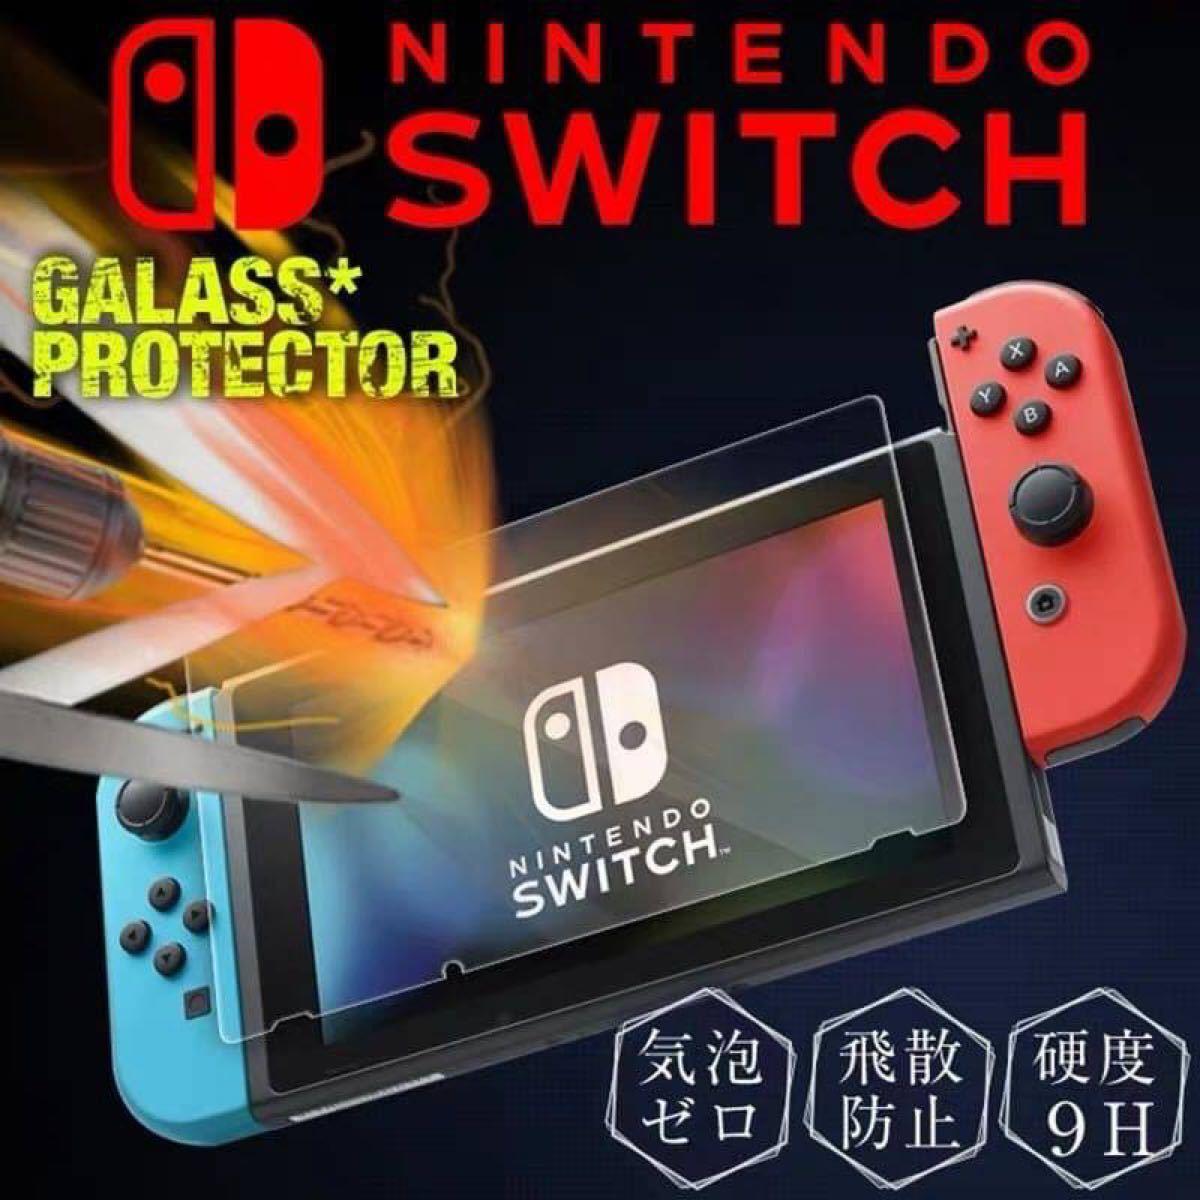 Nintendo Switch 任天堂 スイッチ 保護フィルム ブルーライト 液晶 画面 新品未使用 送料無料